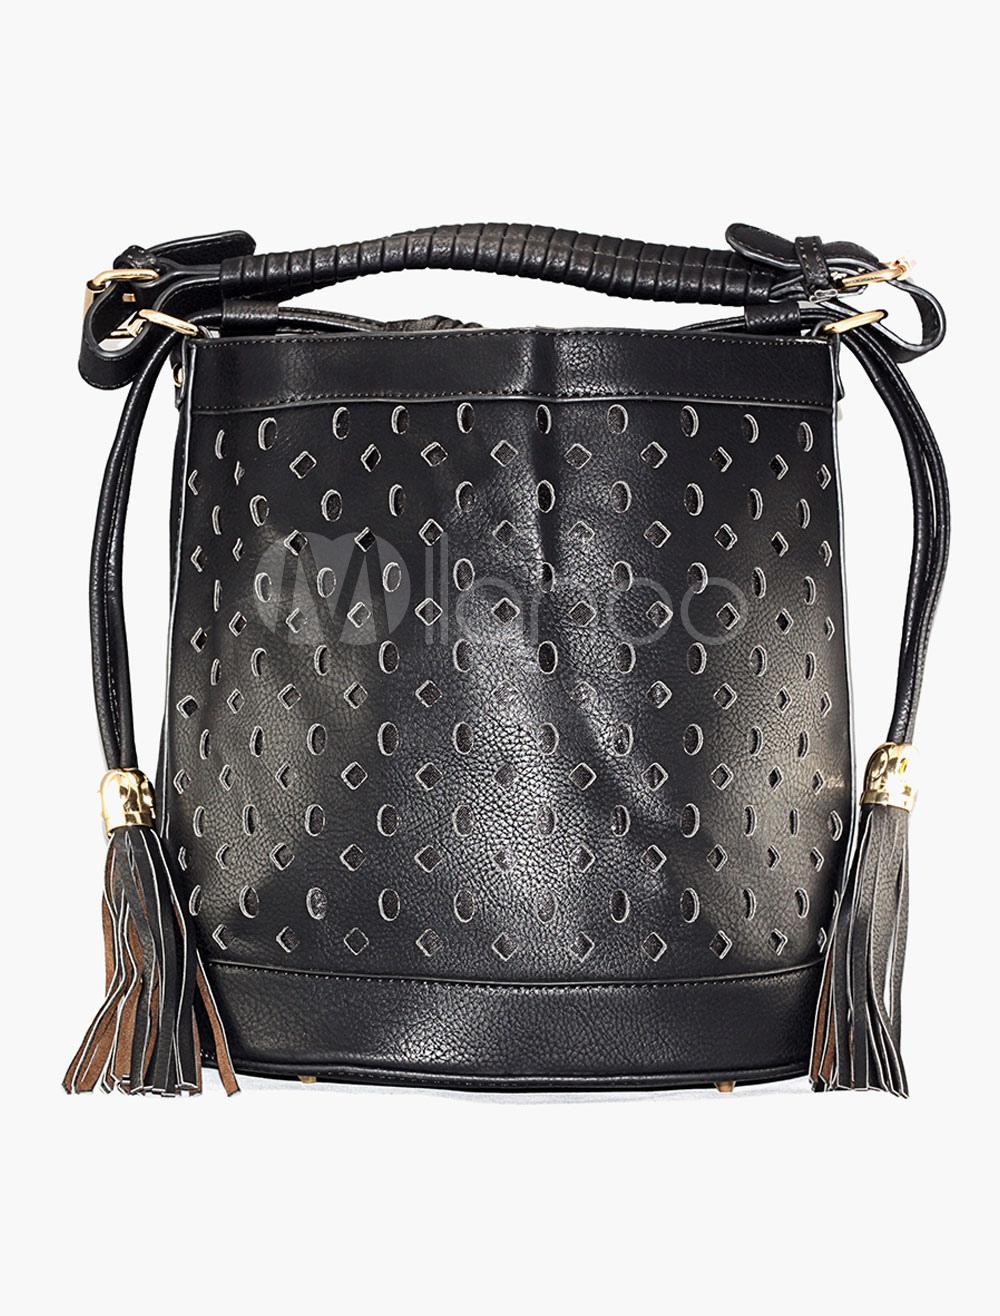 noir sac main sac besace sac f minin seau sac au style boh me de d coupe. Black Bedroom Furniture Sets. Home Design Ideas